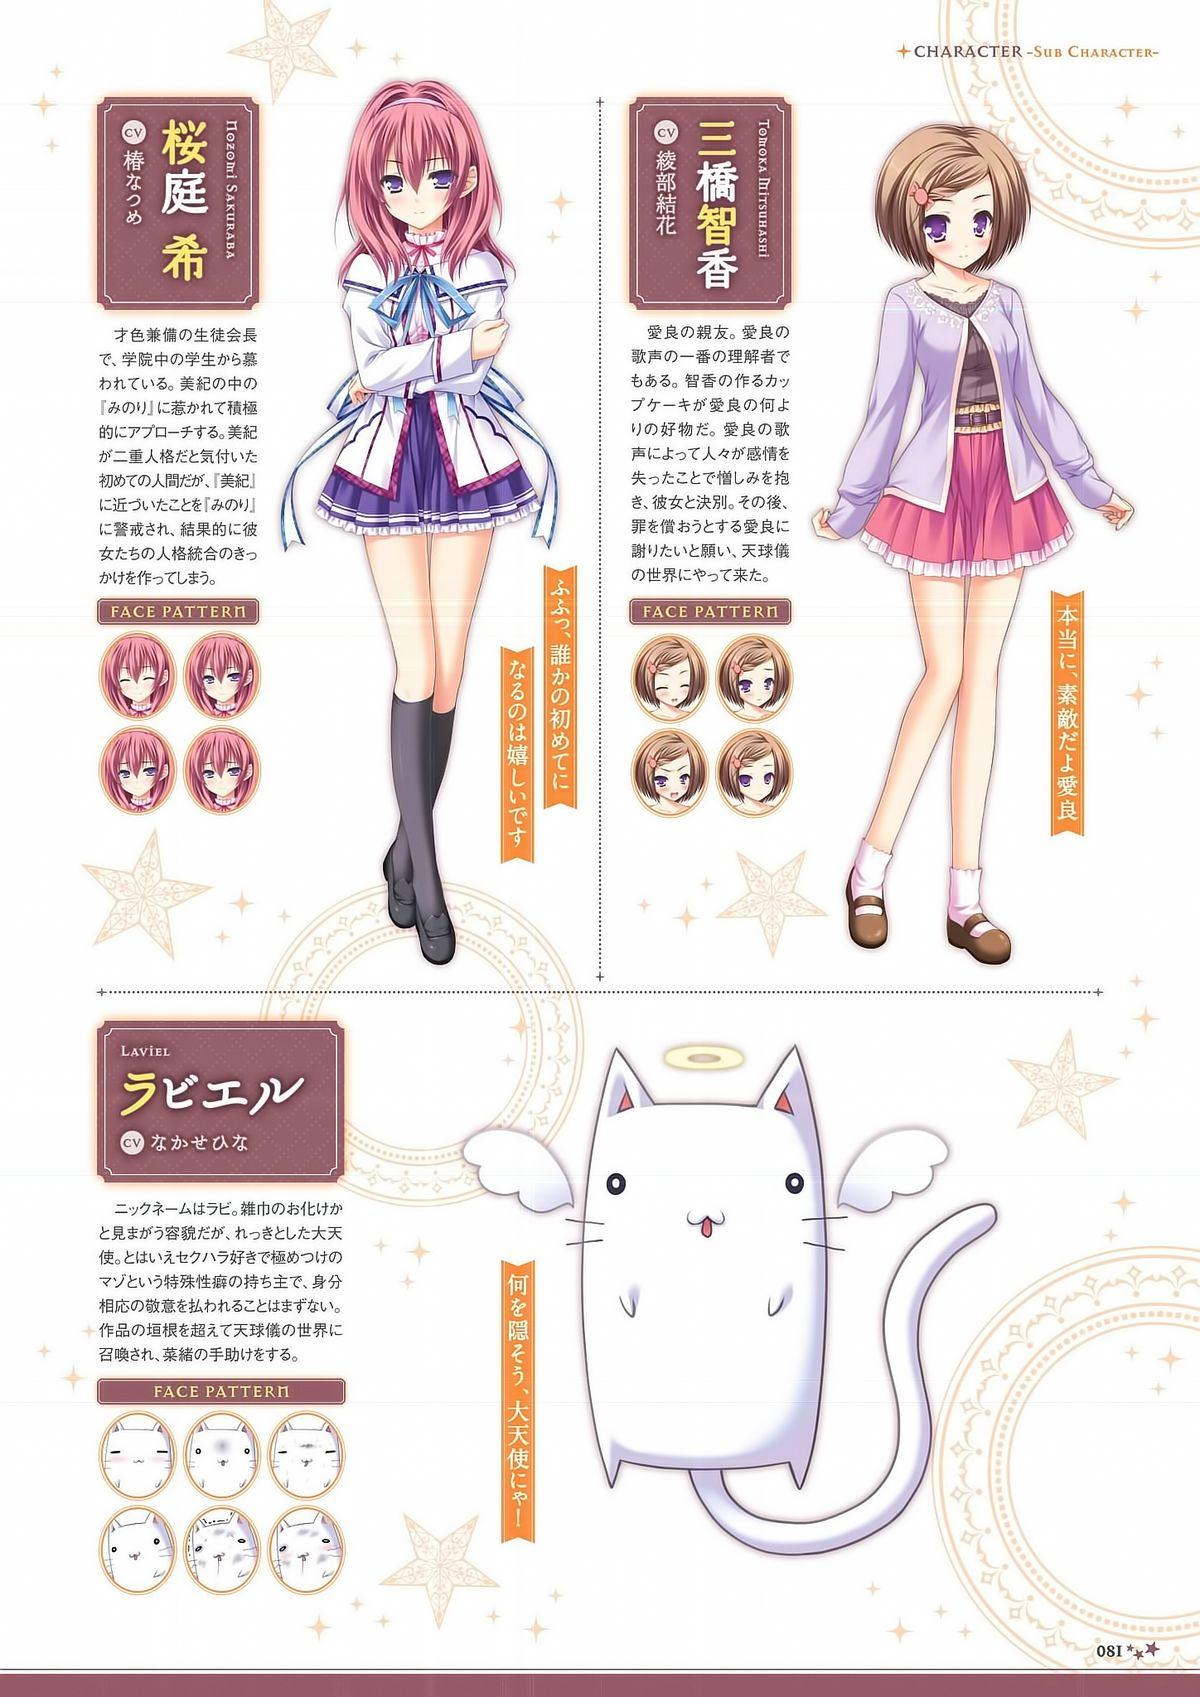 Sekai to Sekai no Mannaka de Visual Fanbook 81